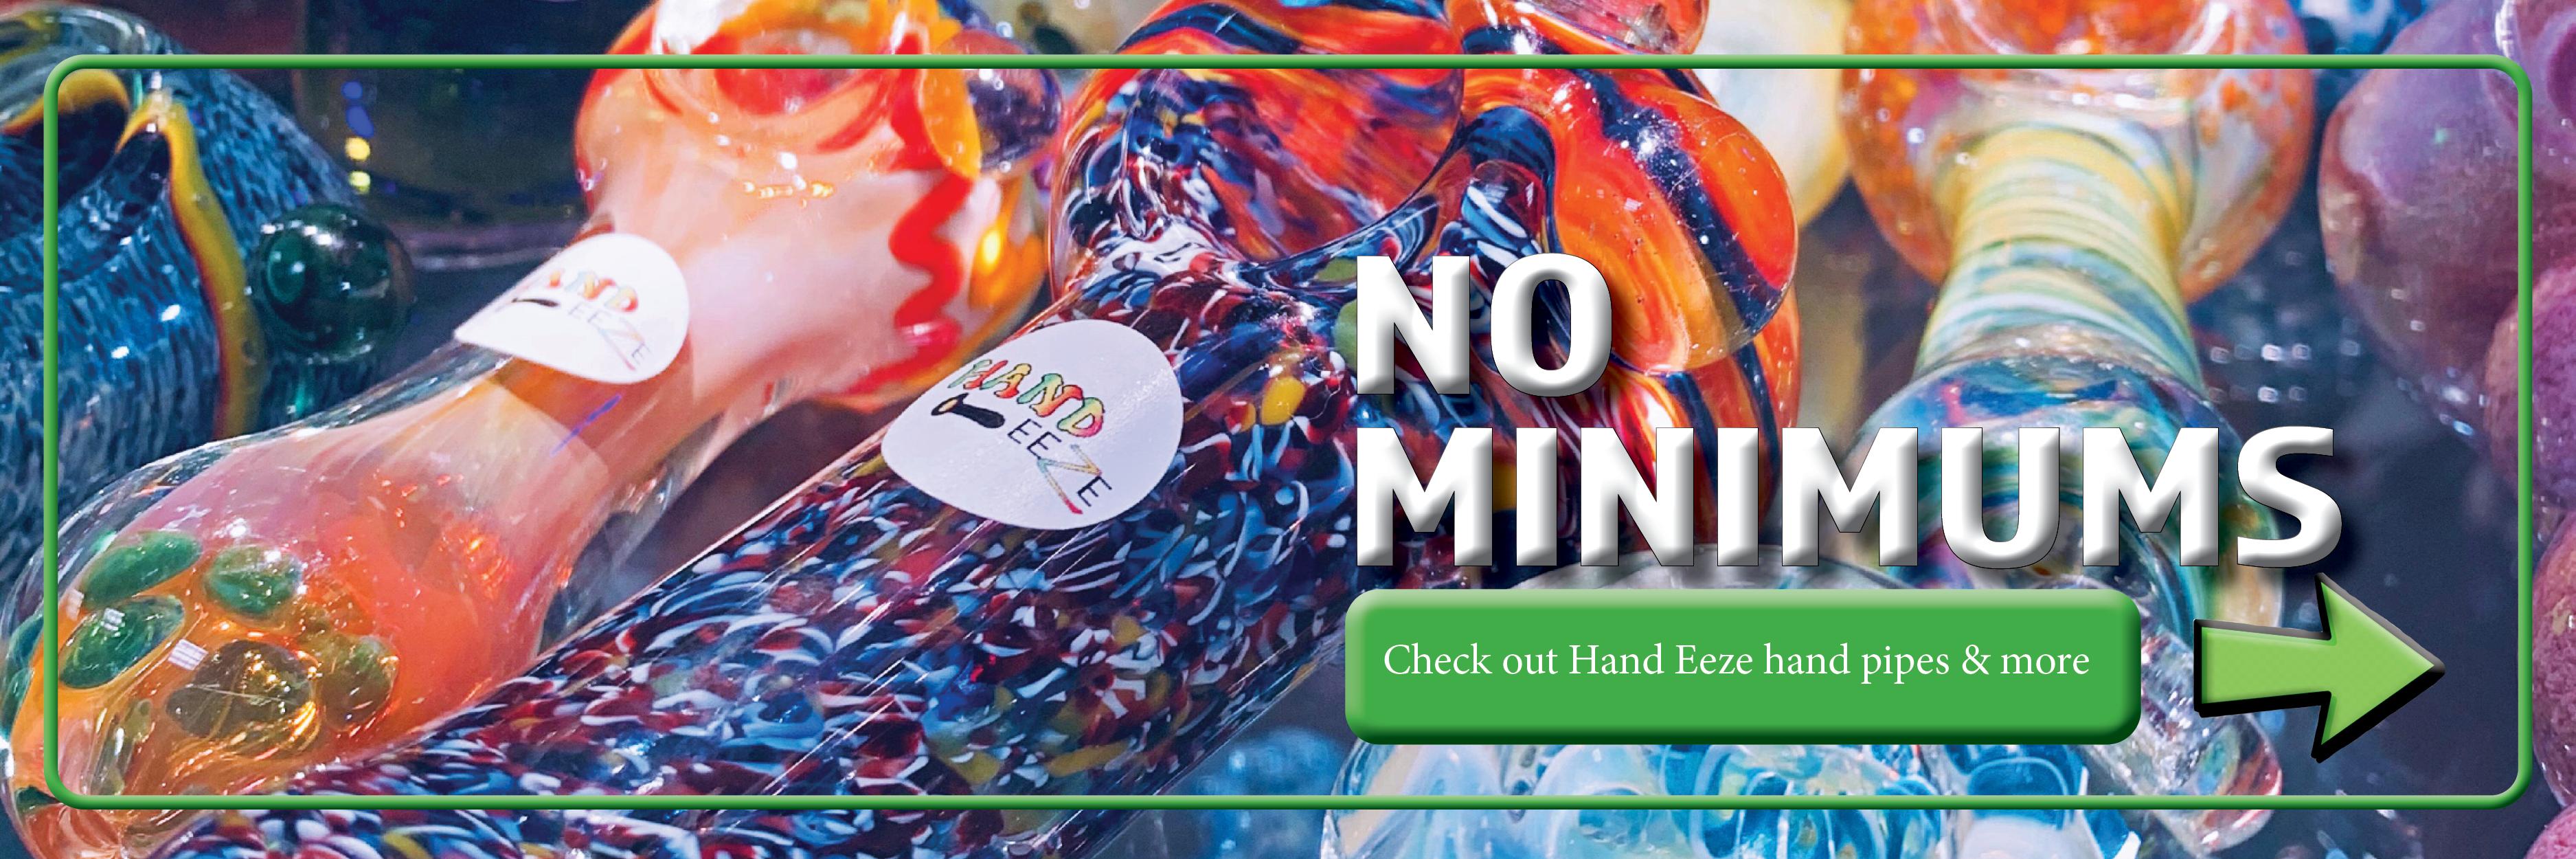 Hand Eeze hand pipes UNS Wholesale Smoke Shop Head Shop Novelty Supplies